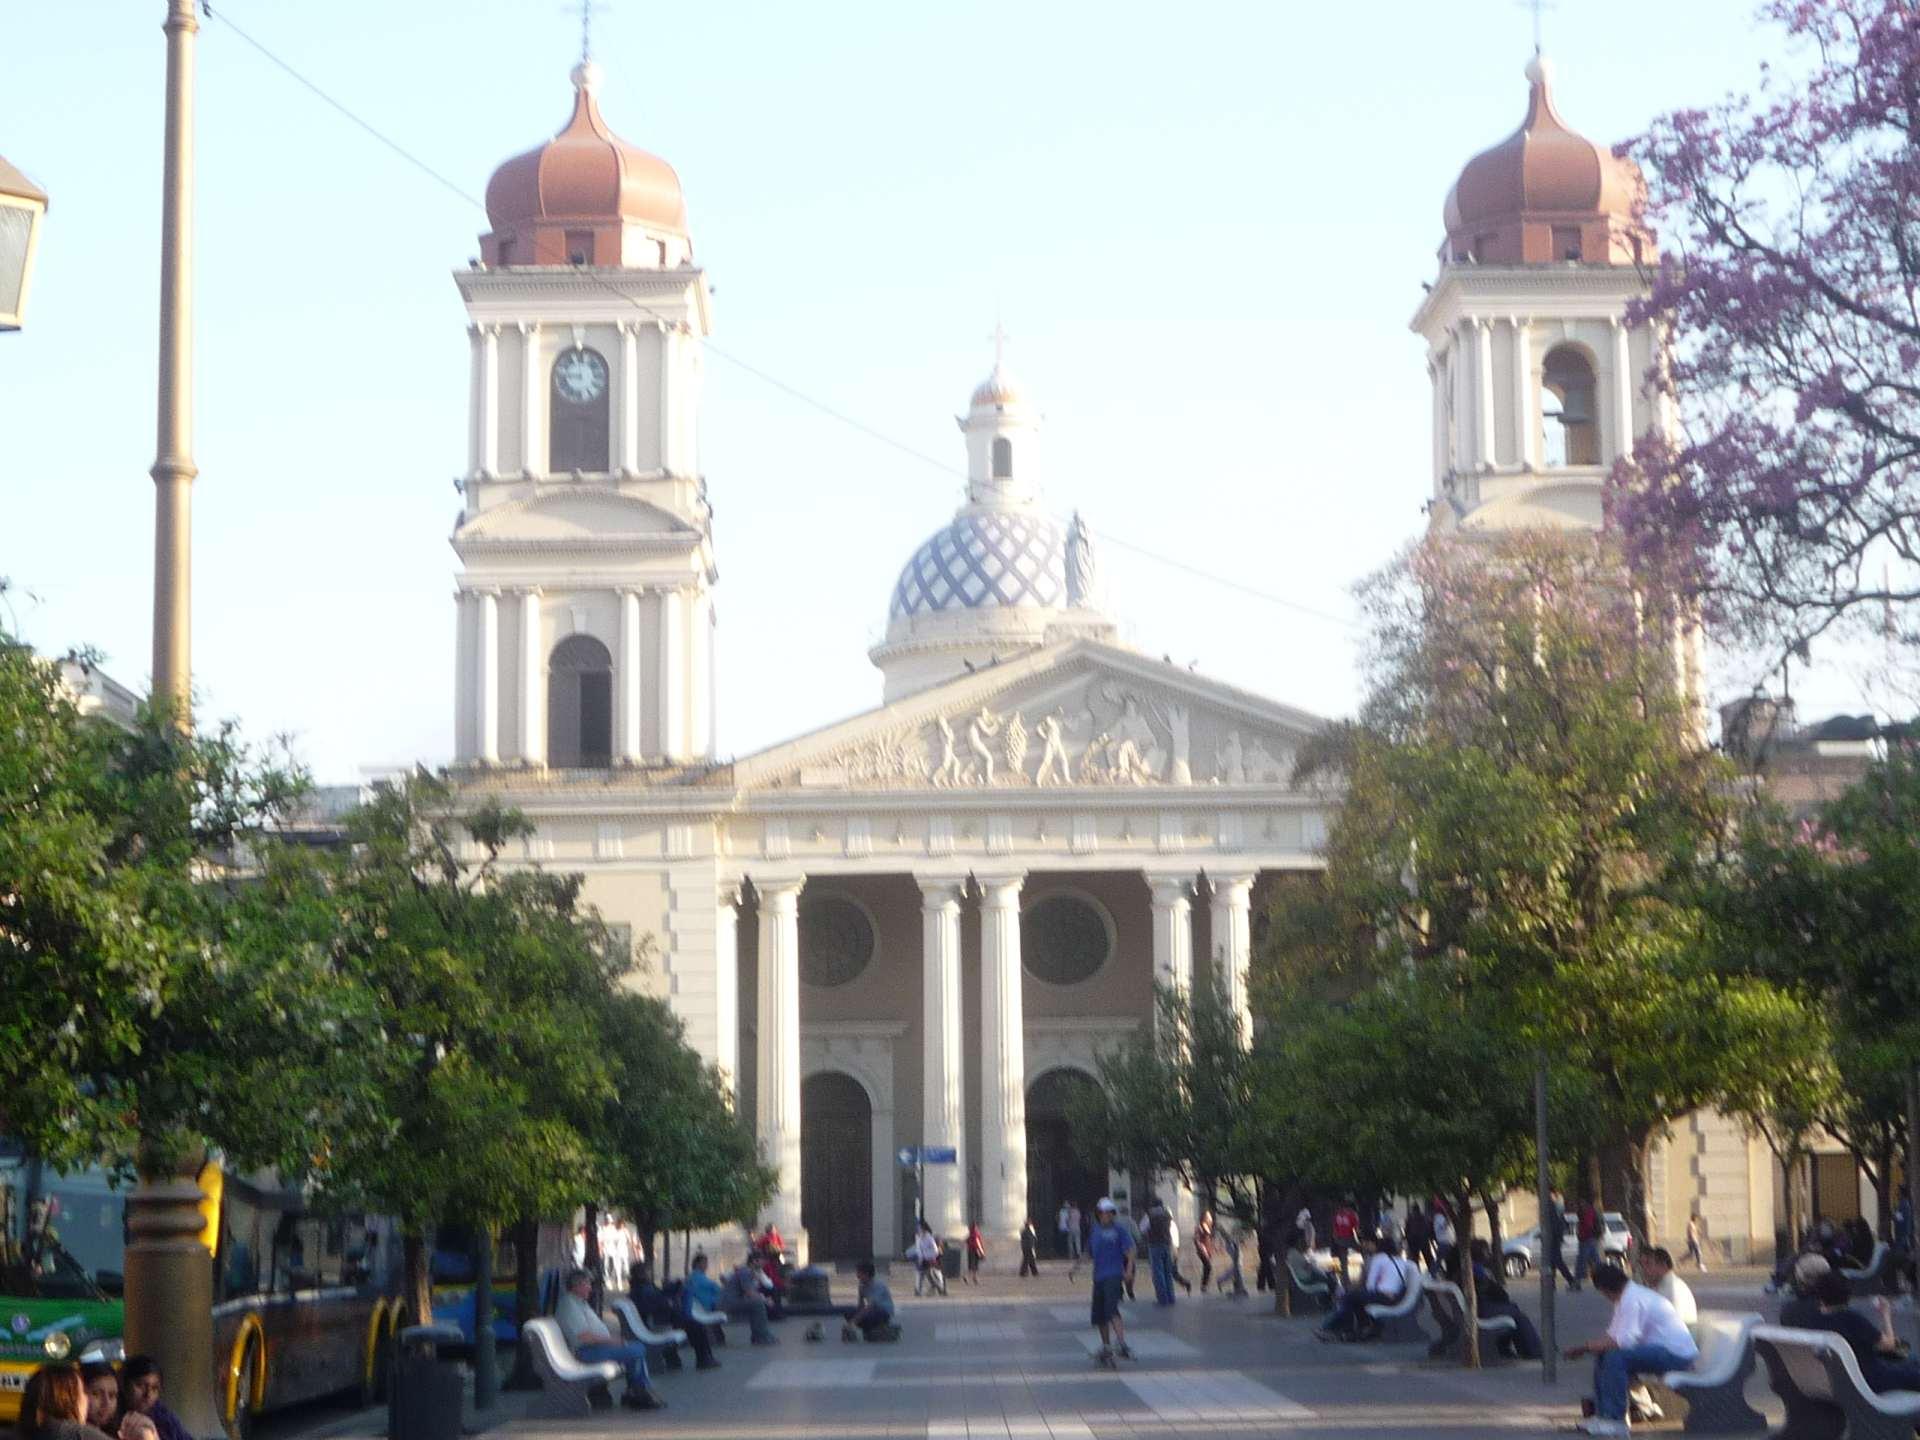 San-Miguell-de-Tucuman